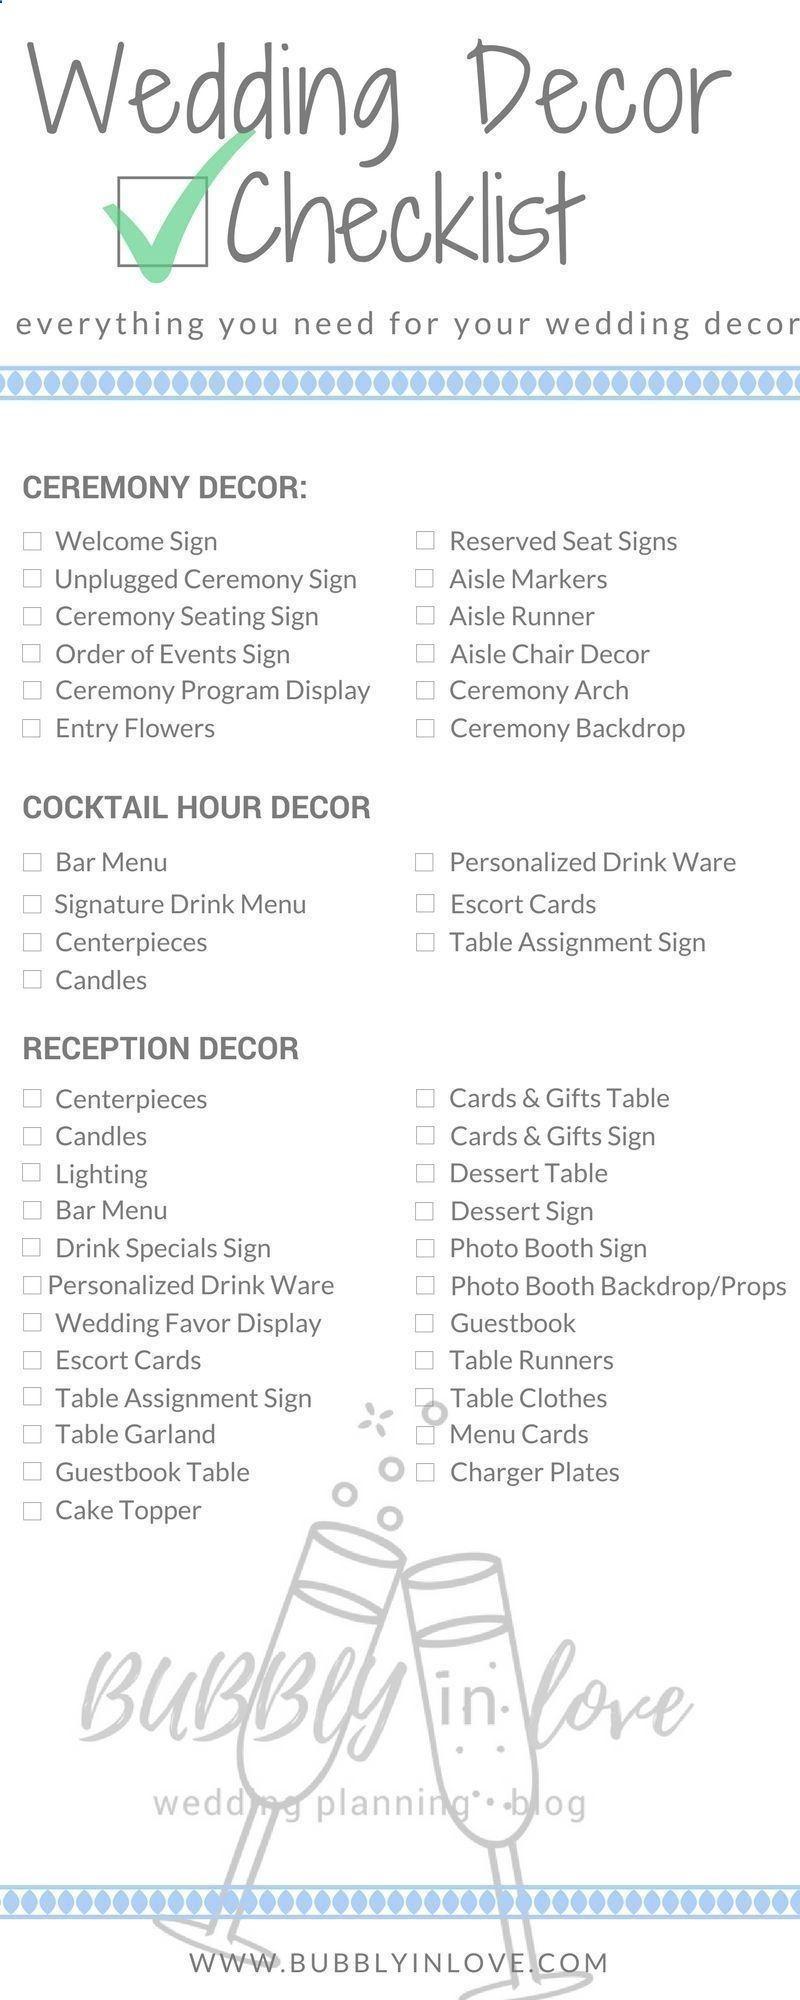 Wedding Decor Checklist Wedding Decor Ceremony Decor Reception